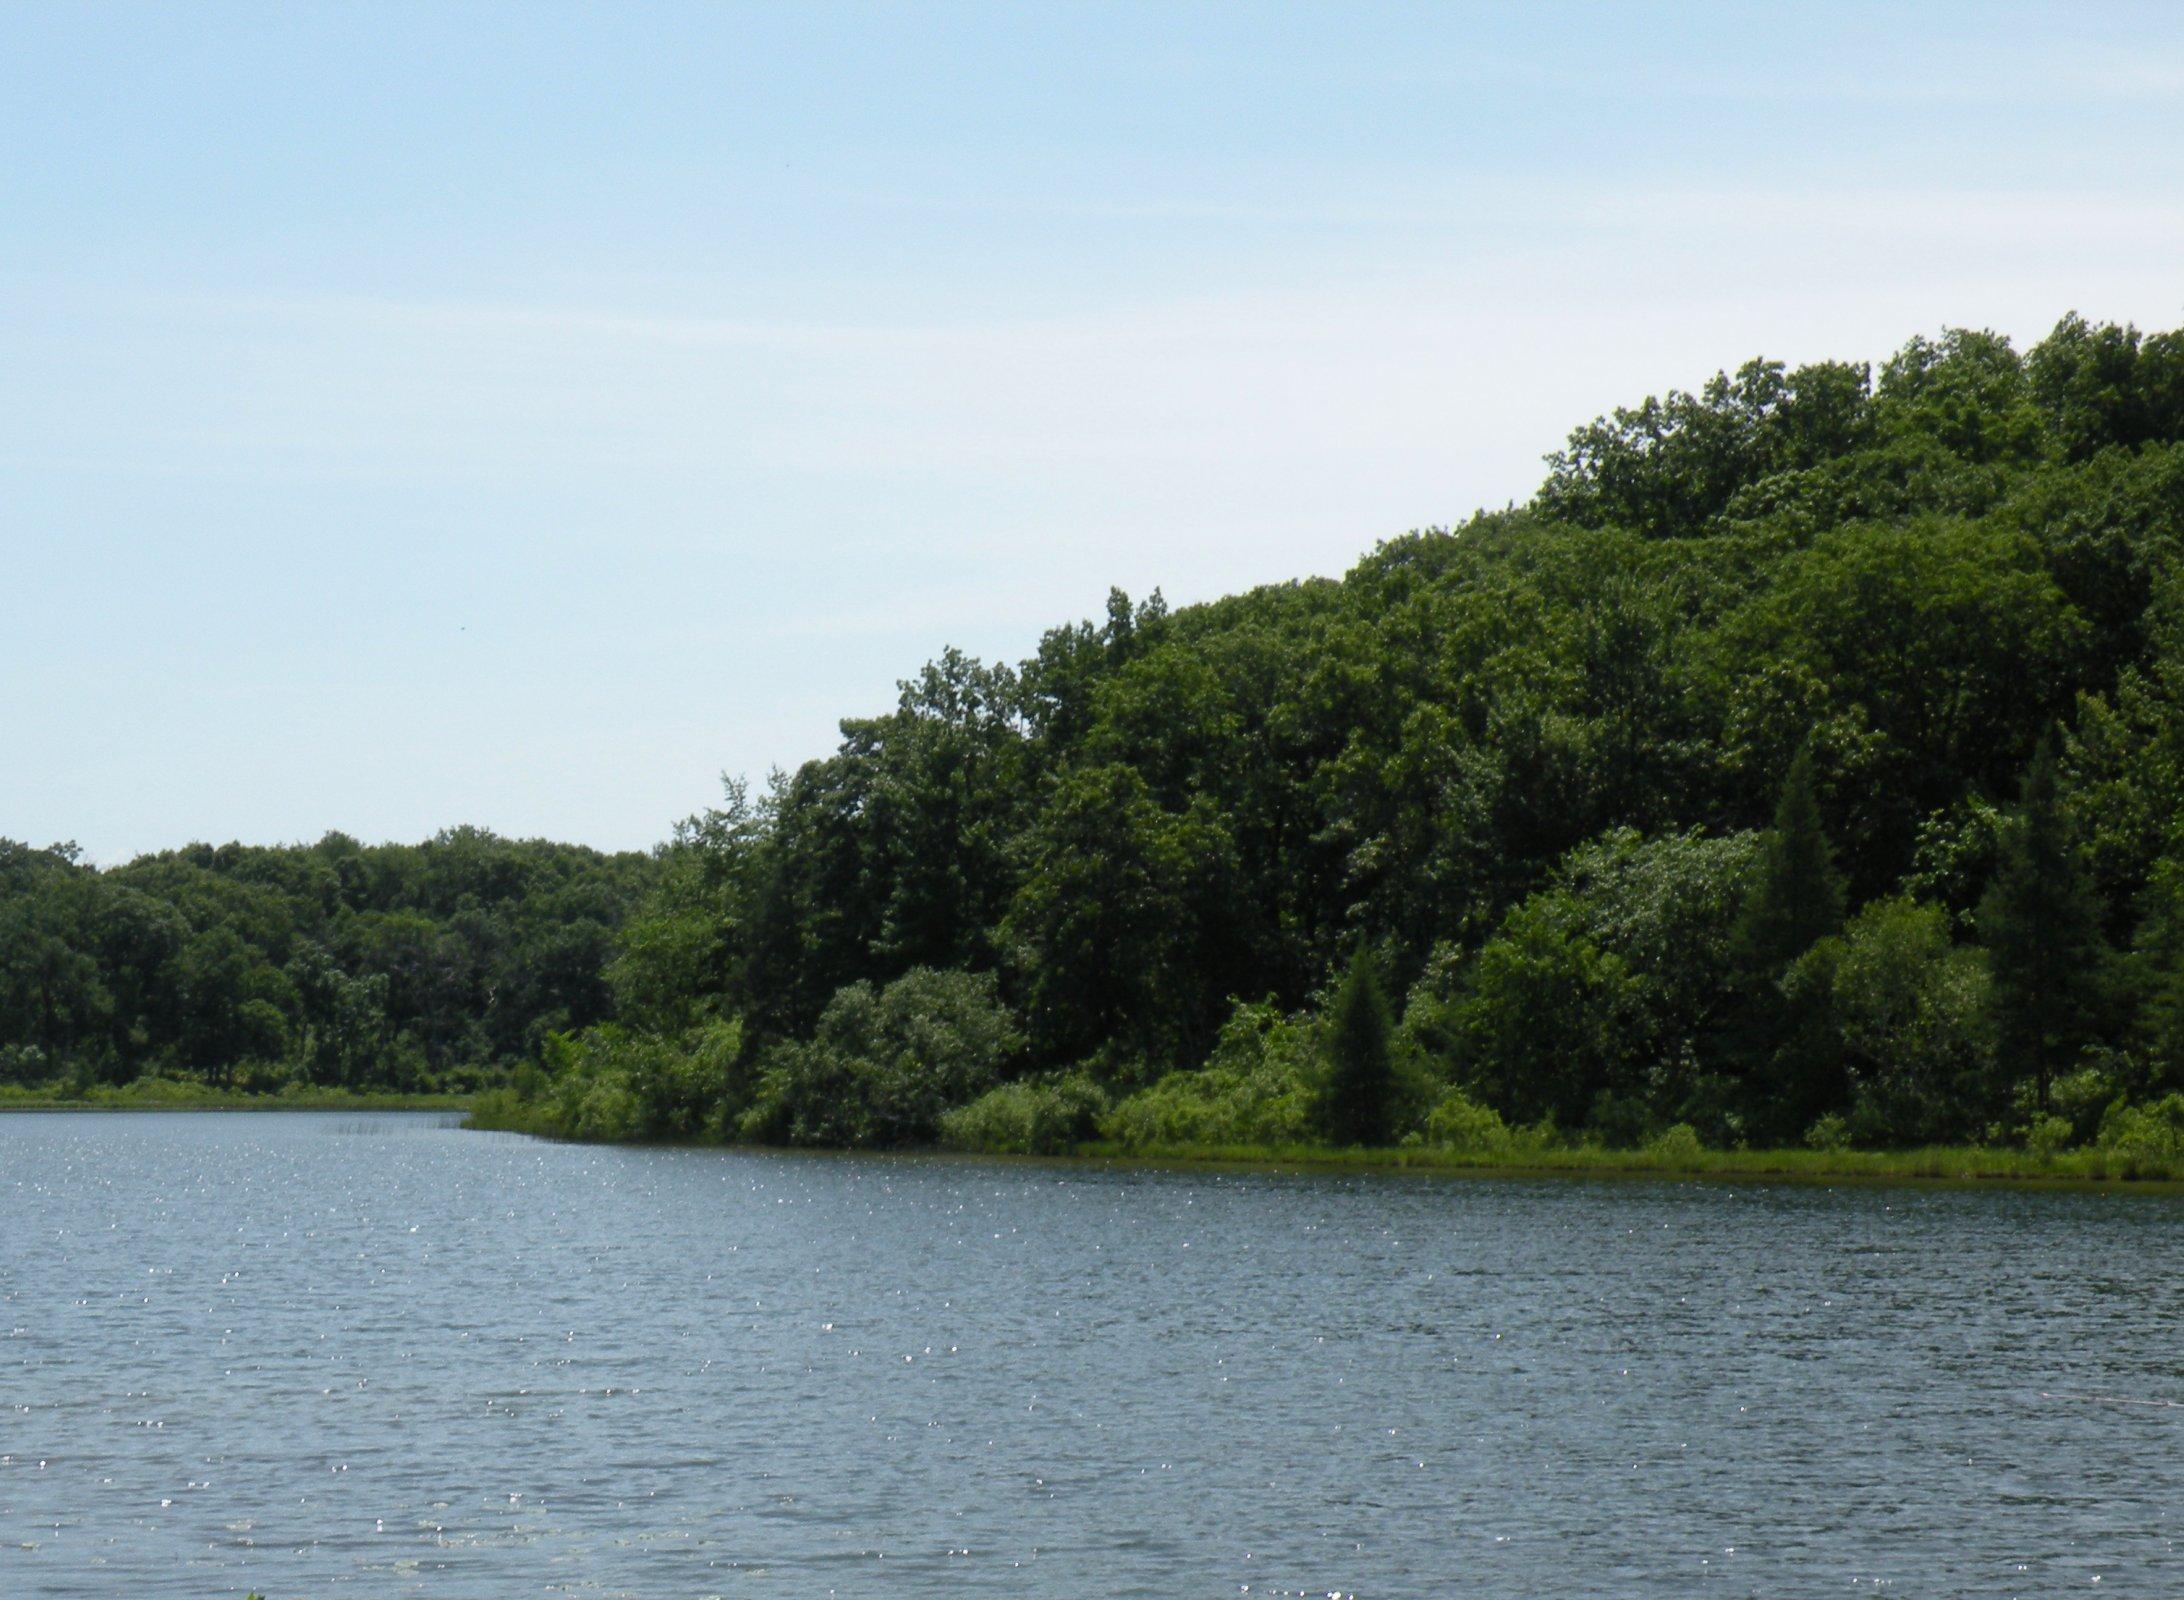 Ennis Lake, a spring-fed lake that covers 30 acres. Photo taken by John W. Iwanski.